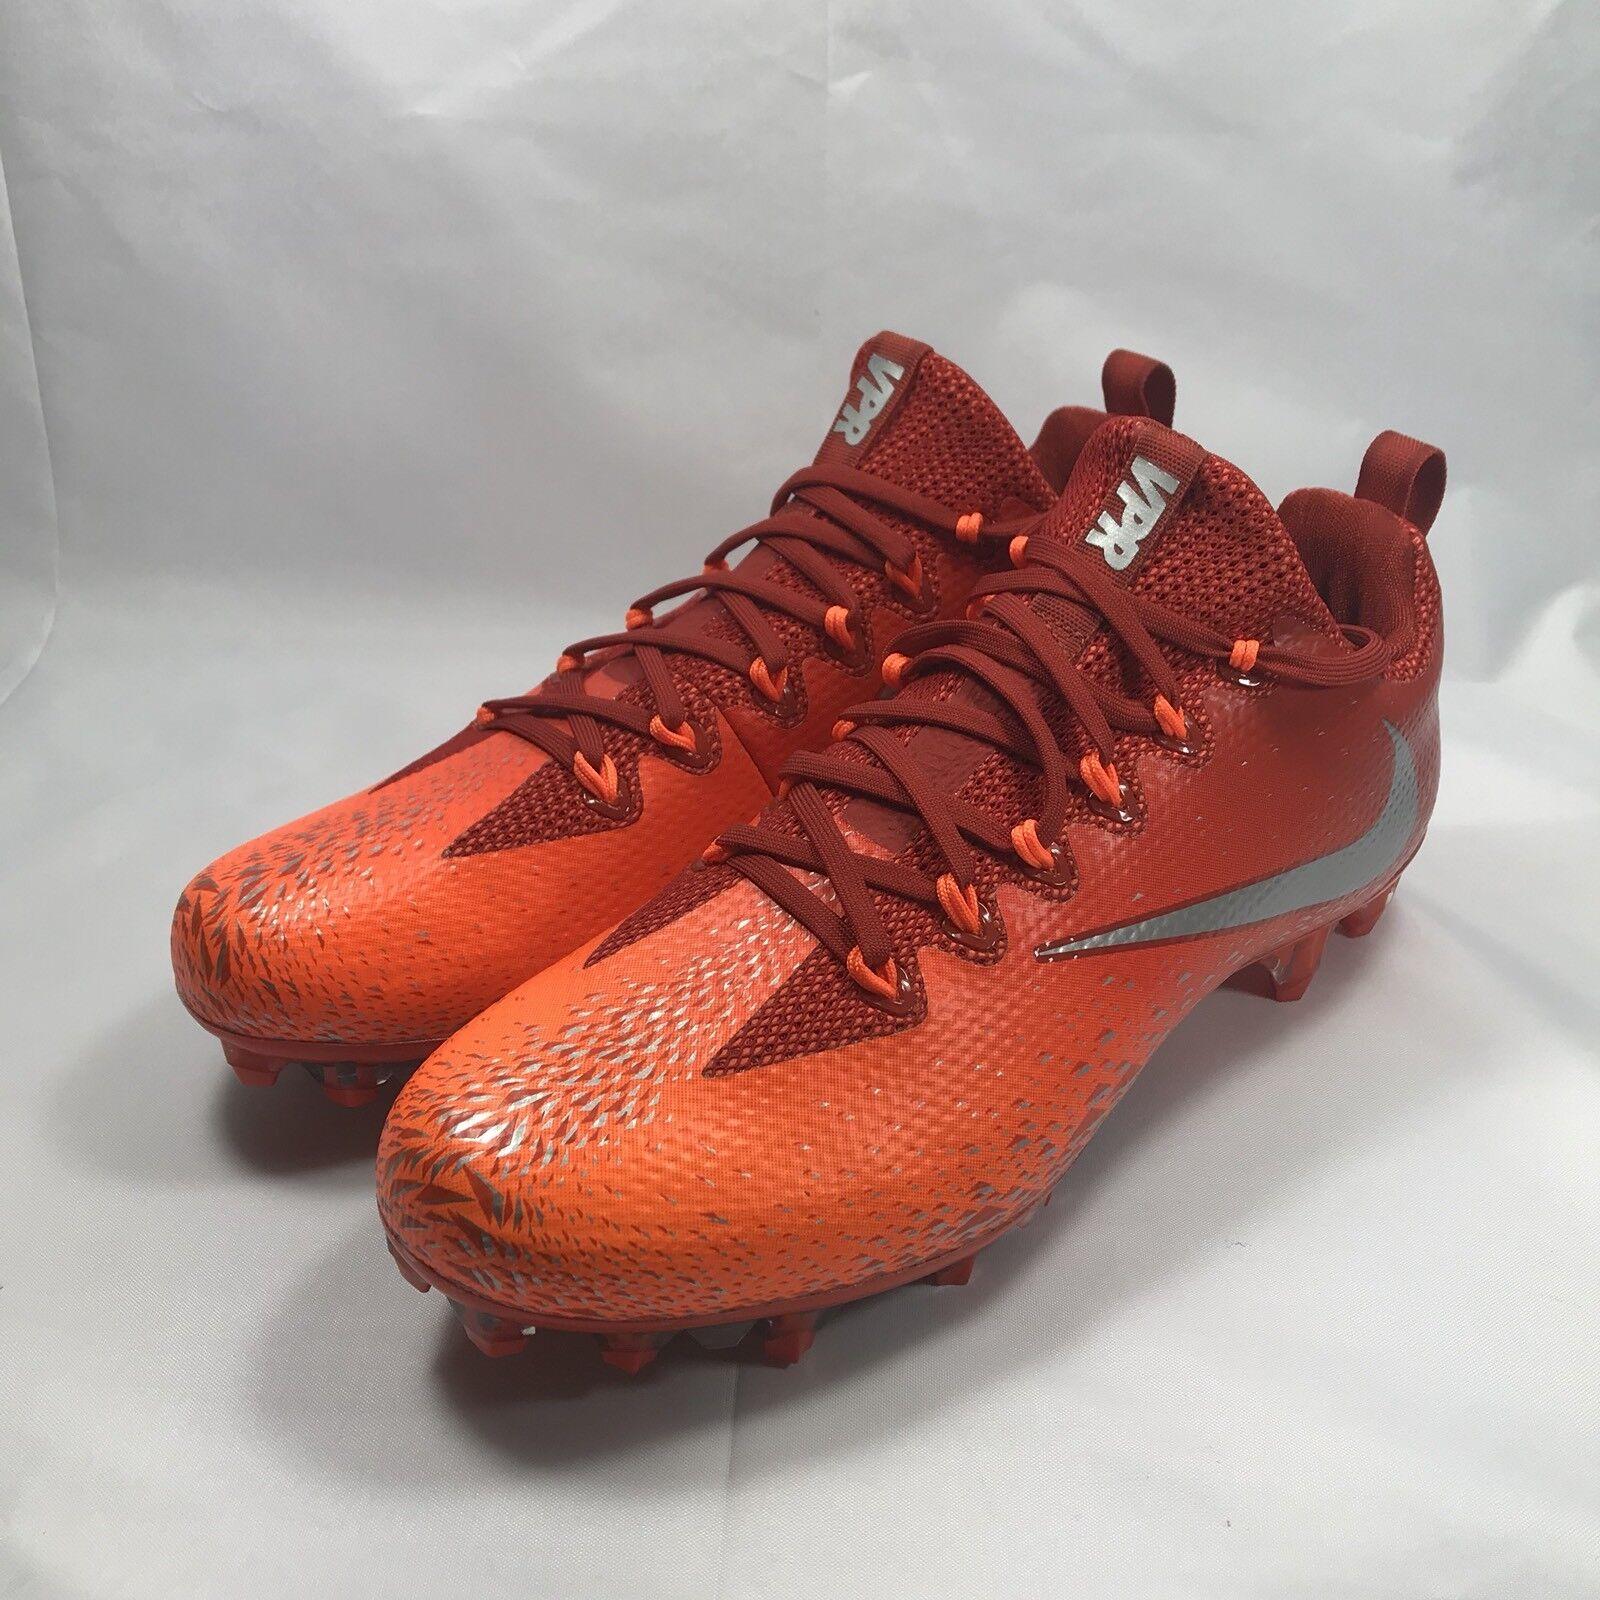 New Mens Nike Vapor Untouchable Pro 833385-606 Orange Football Cleats Size 10